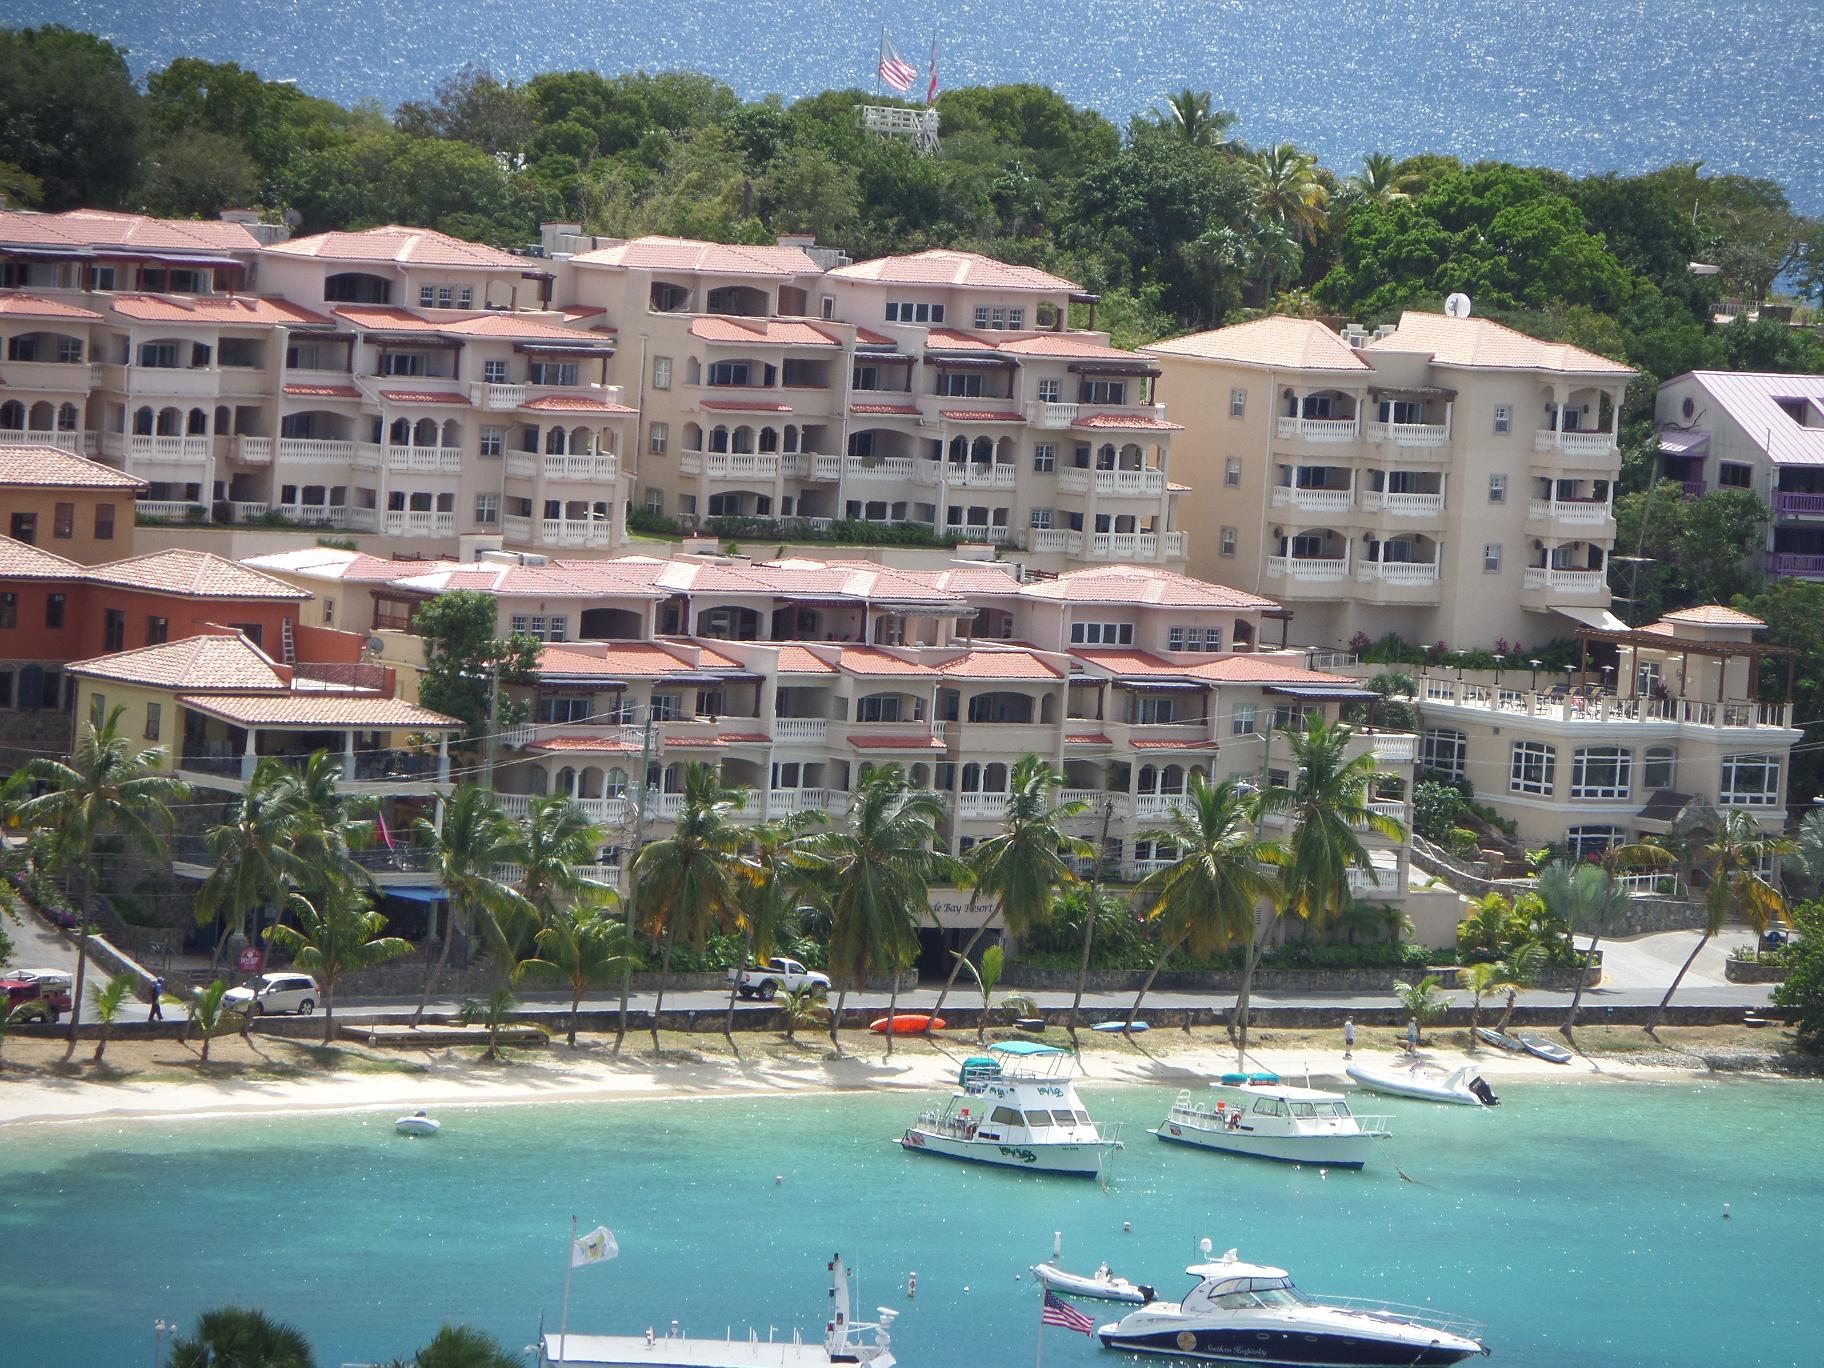 Hotel island john st virgin